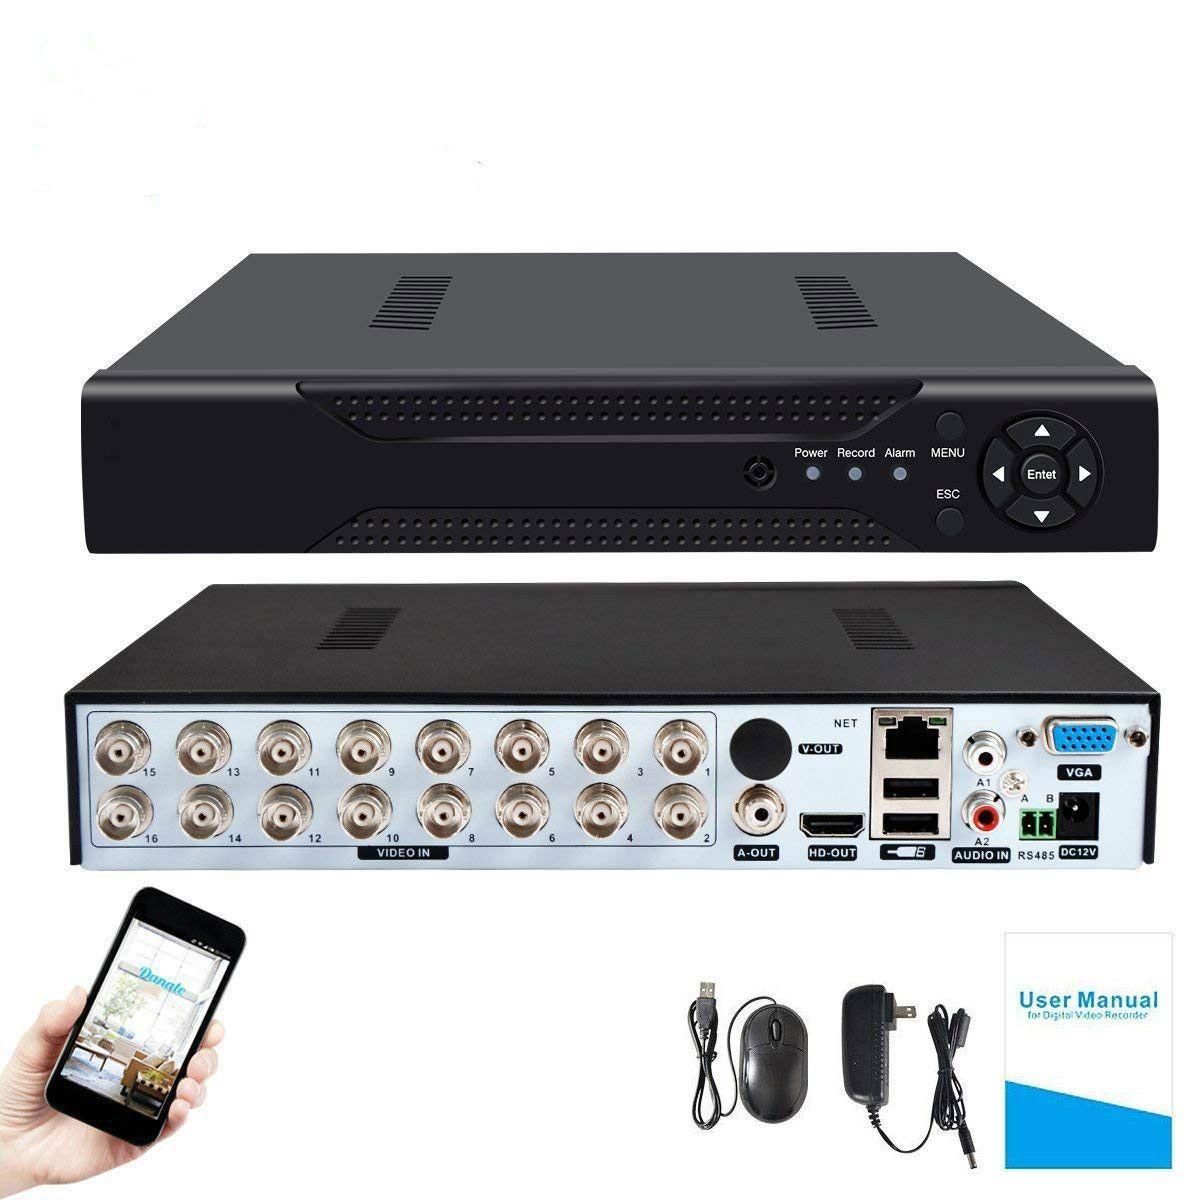 CCTV AHD DVR 5MP/4MP 4CH/8CH/16CH H.264 Sicherheit CVI TVI Analog IP Camera5 5MP 4.0MP hybrid Video Recorder 4K Video Ausgang